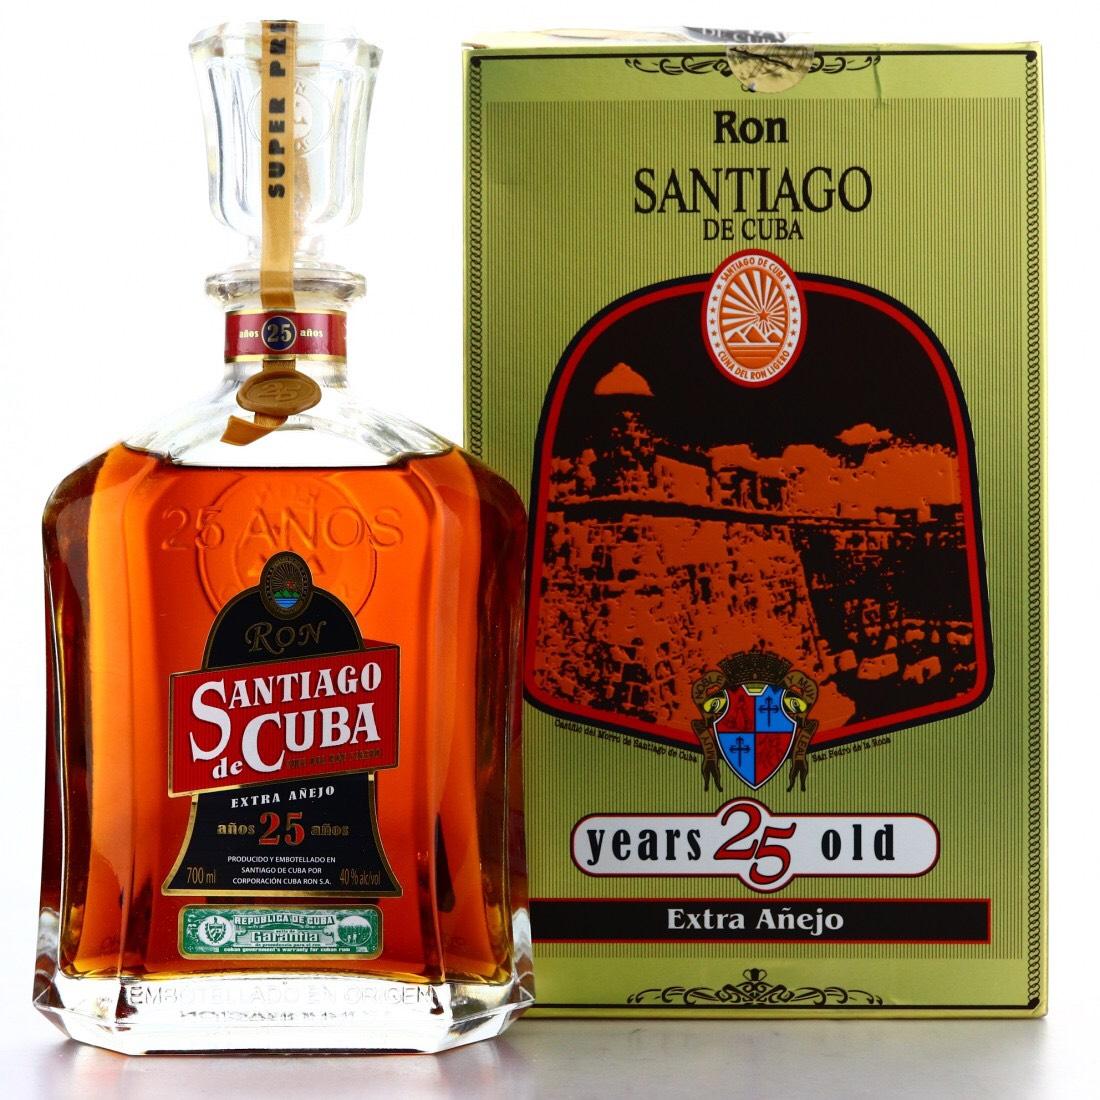 Bottle image of Extra Añejo 25 Años